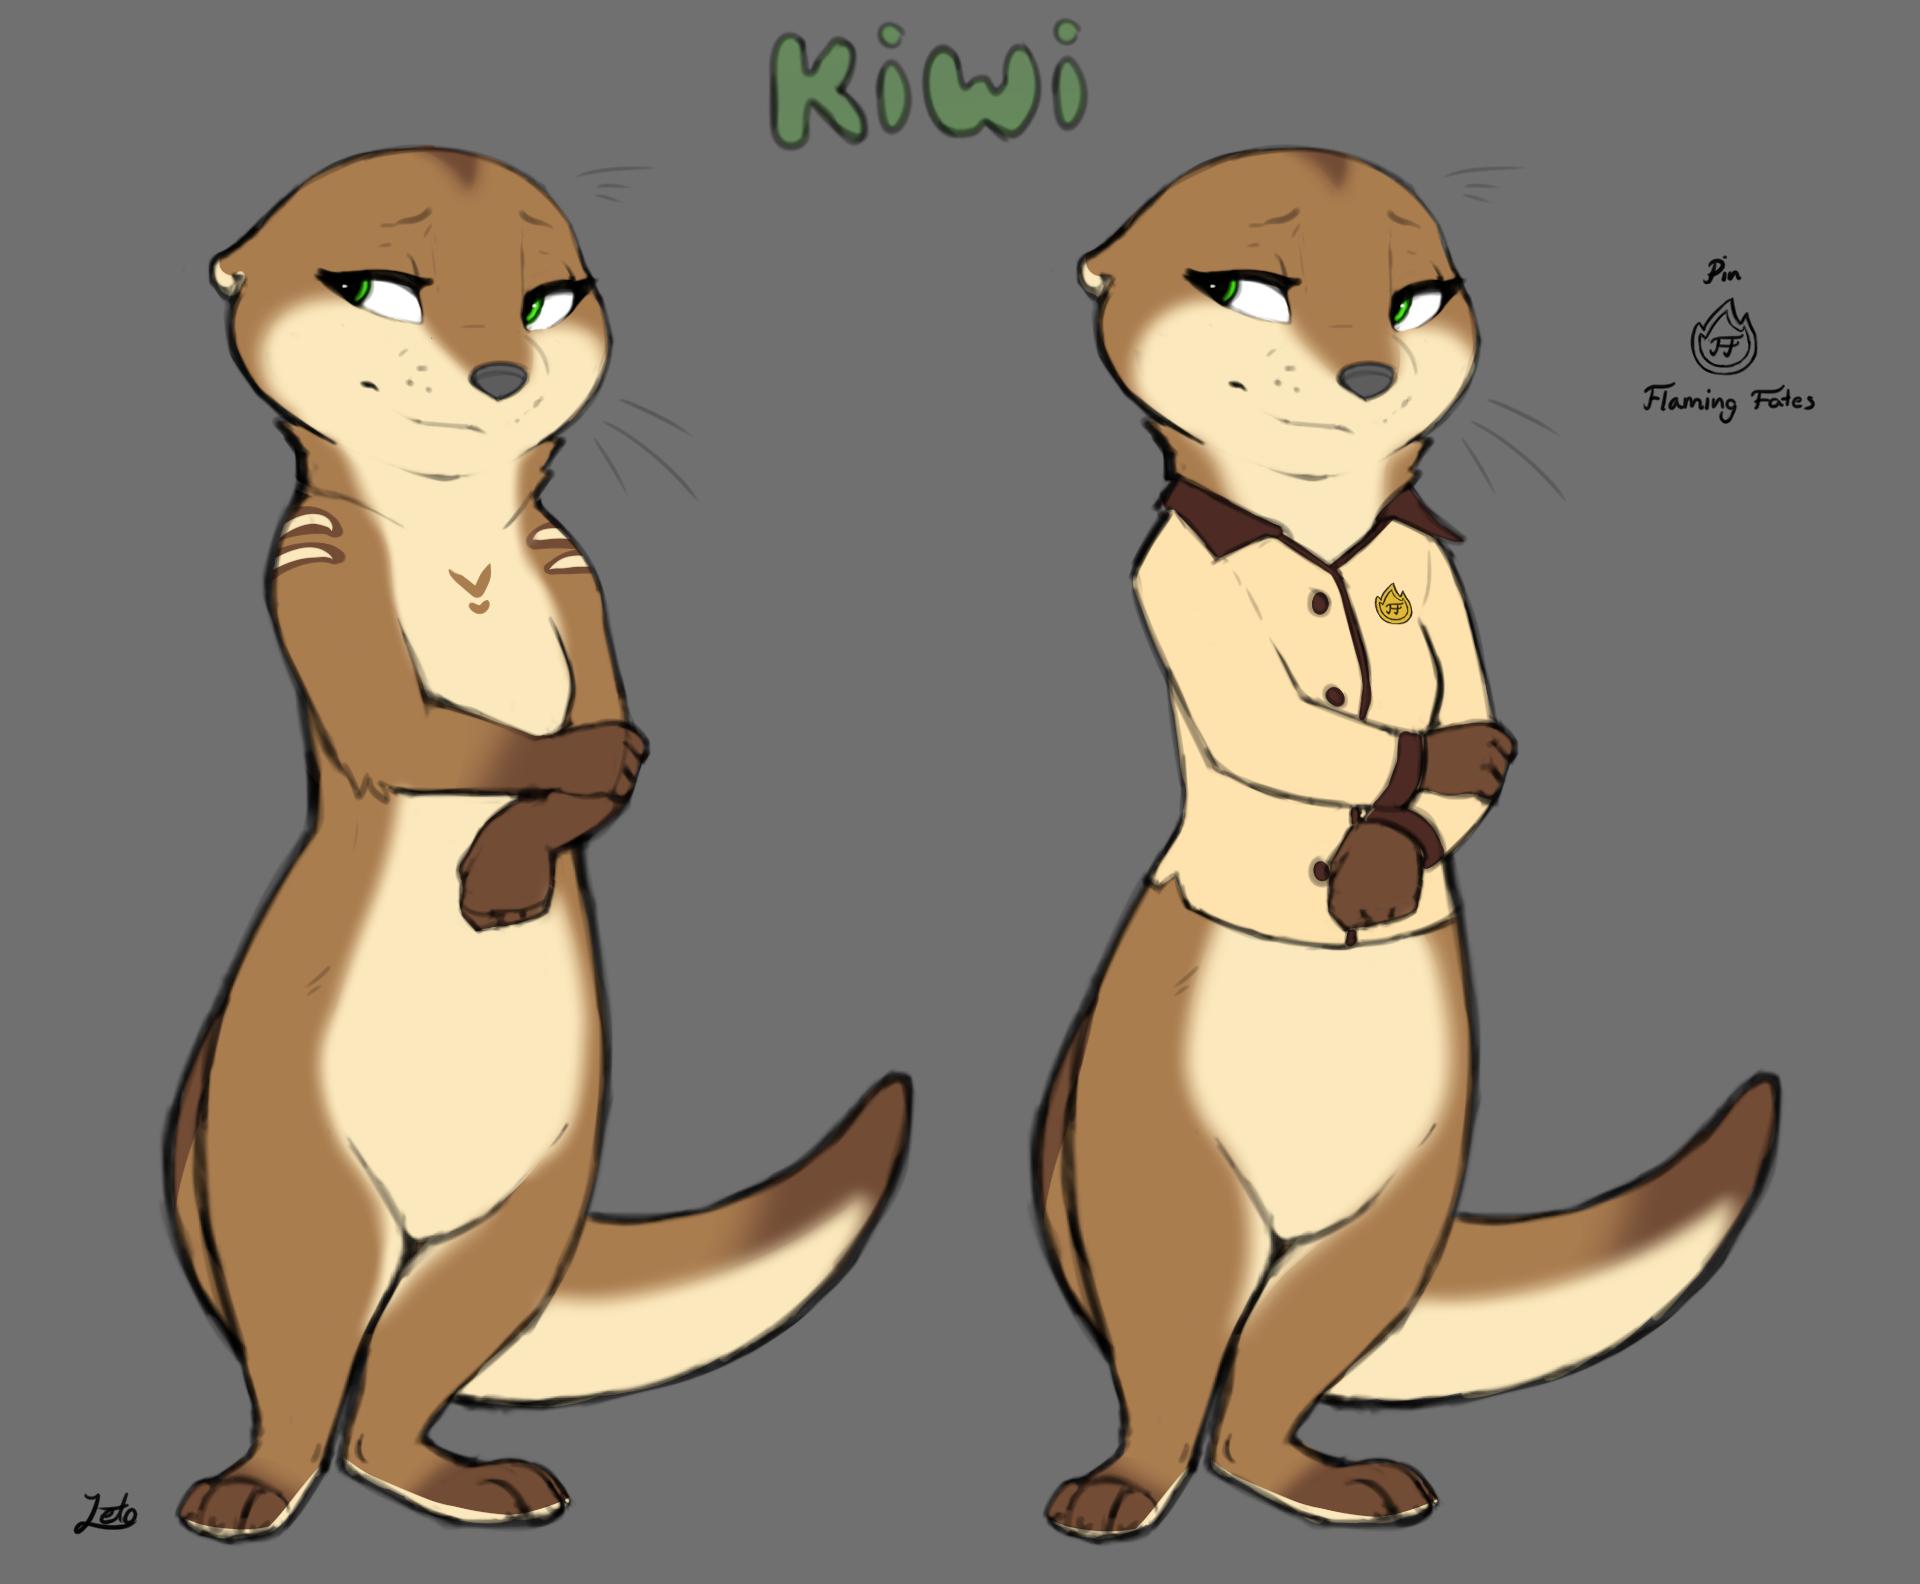 Kiwi the Room Service Otter